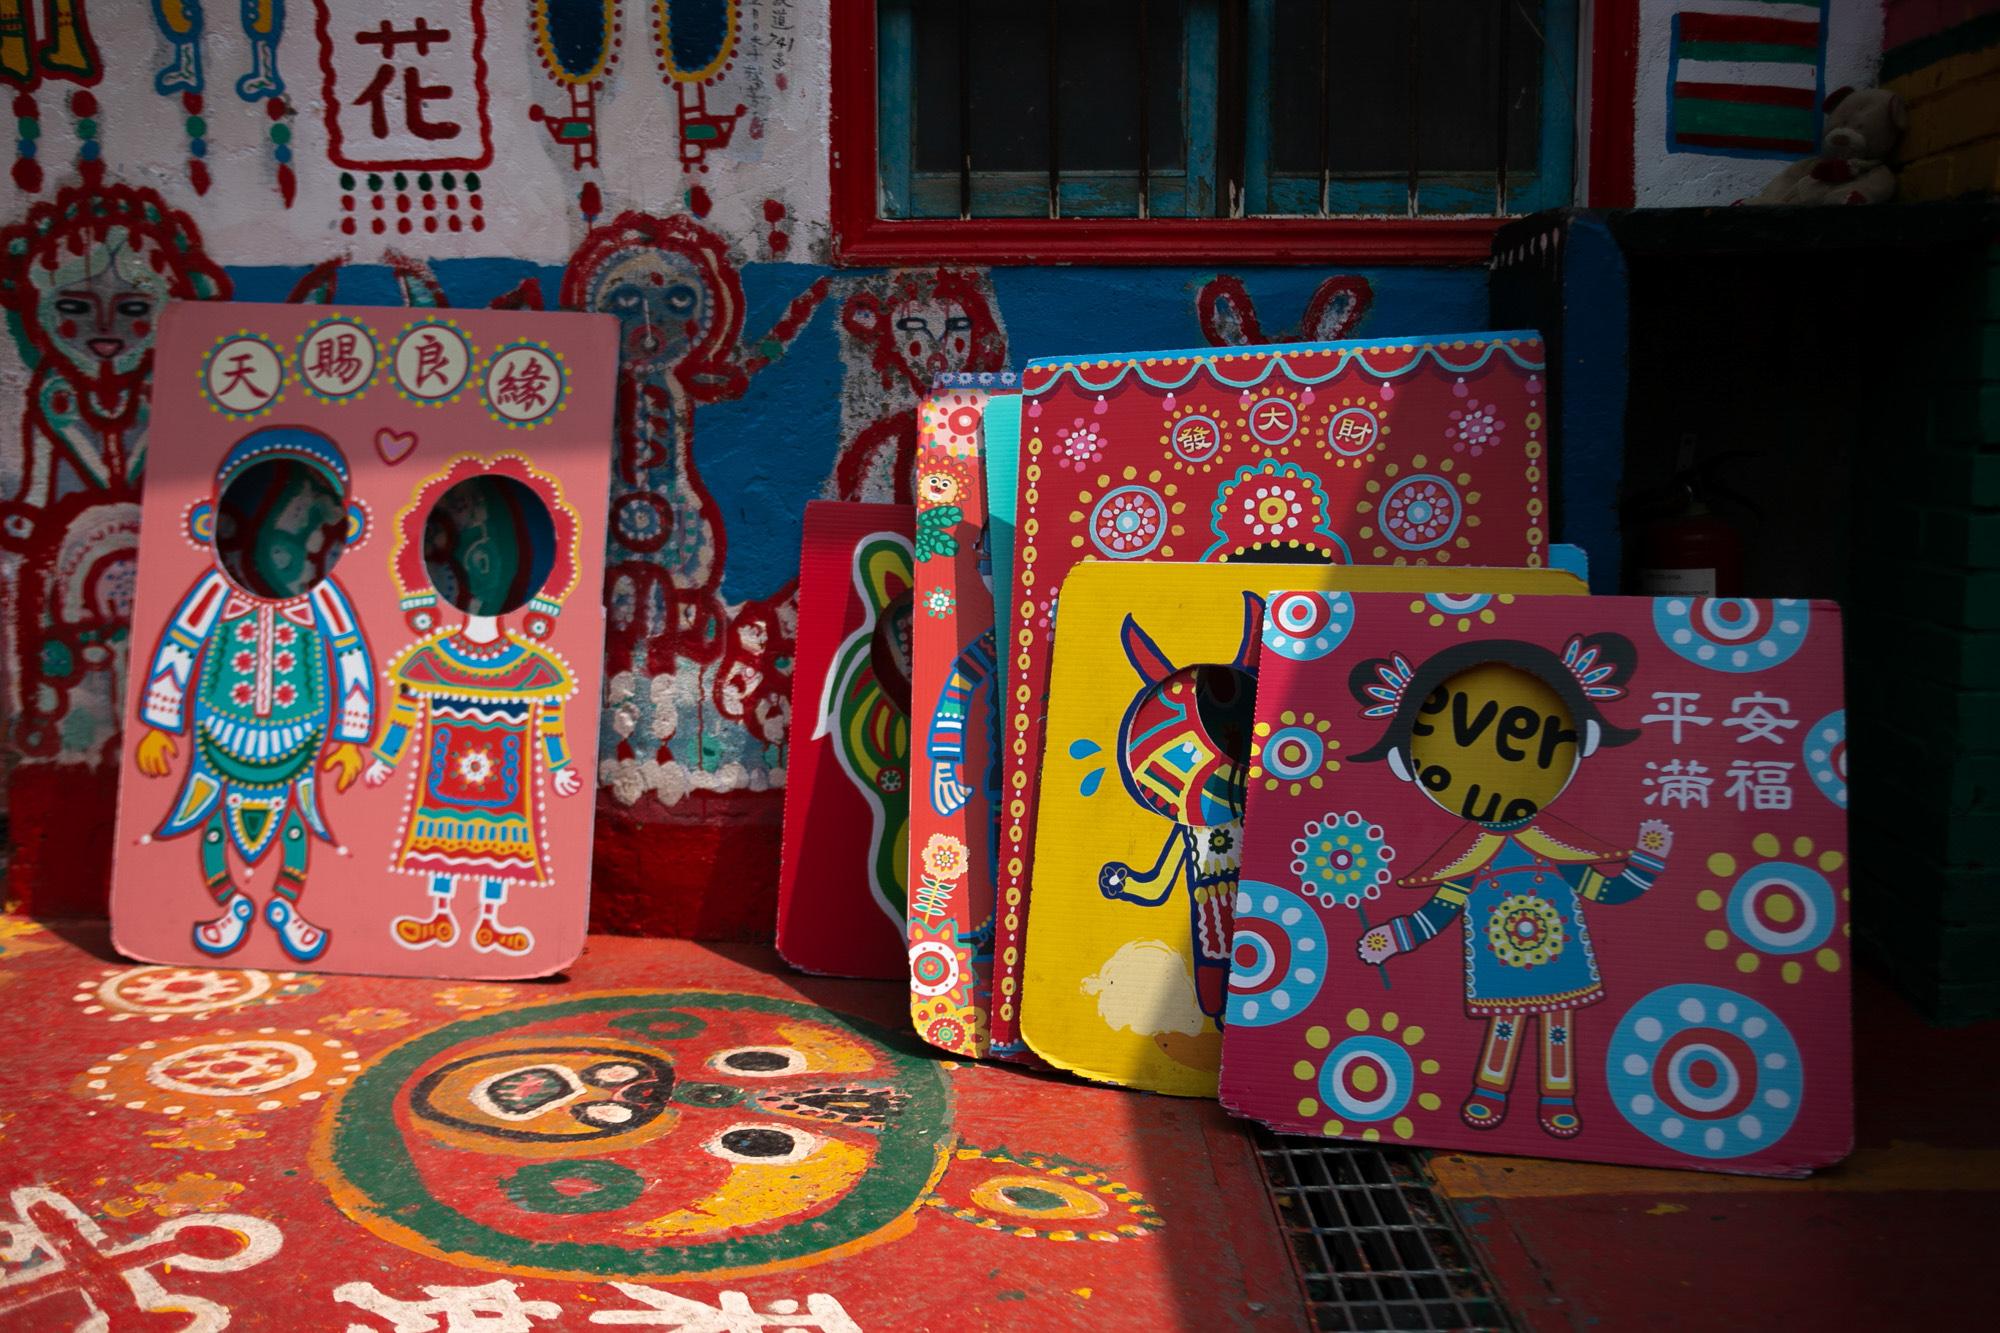 20190508 - Taiwan - Rainbow Village-8.jpg